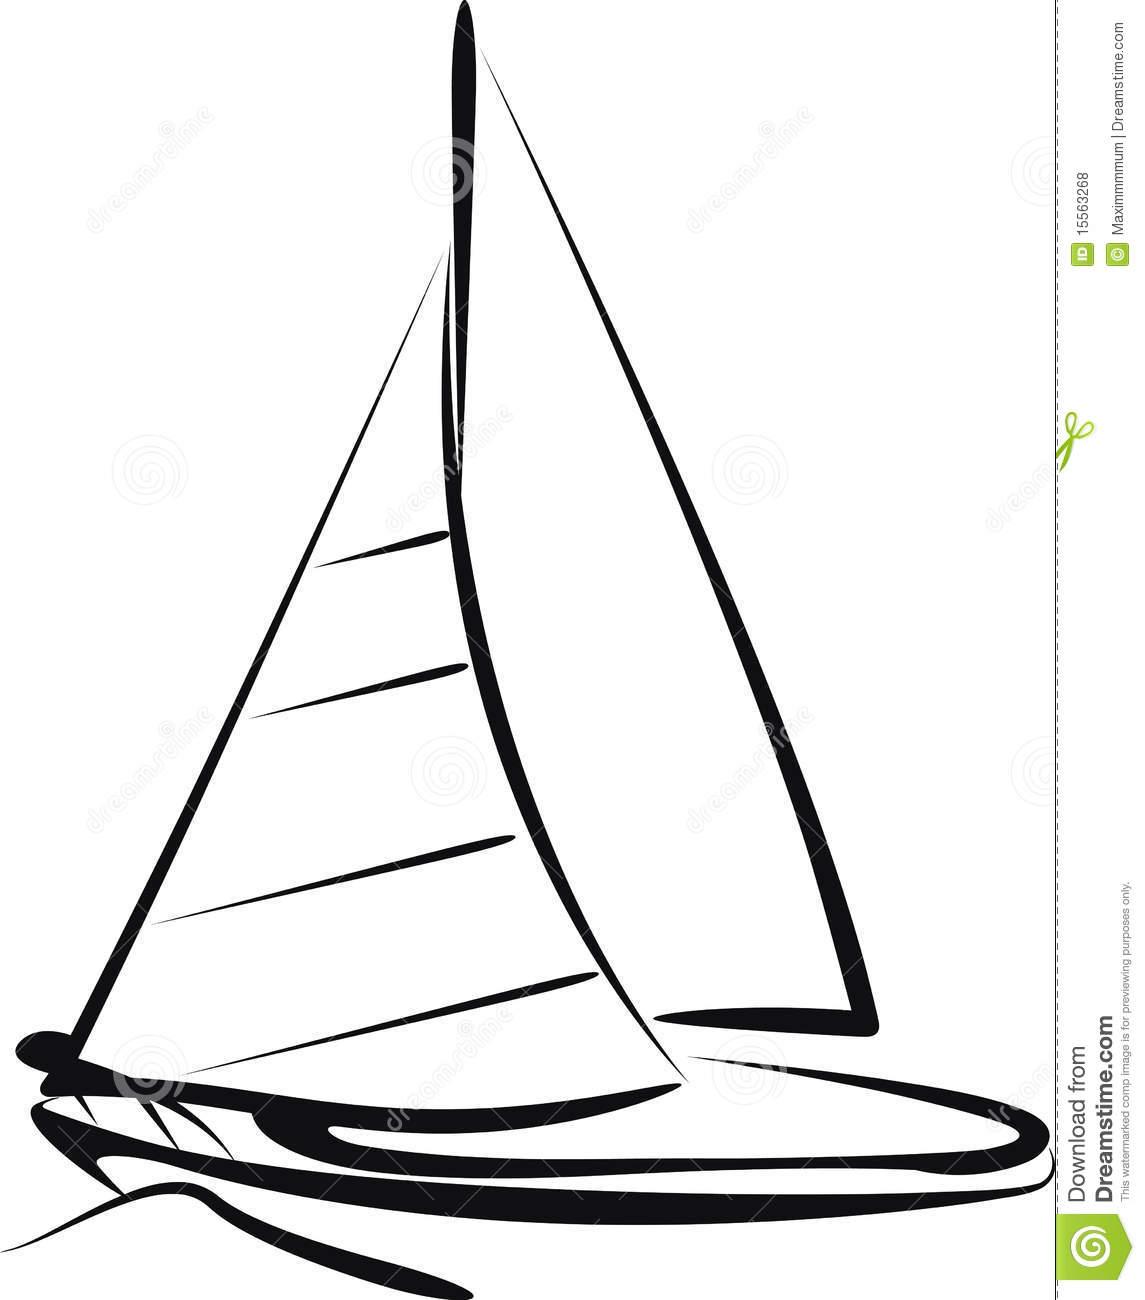 Simple Sailboat Drawing